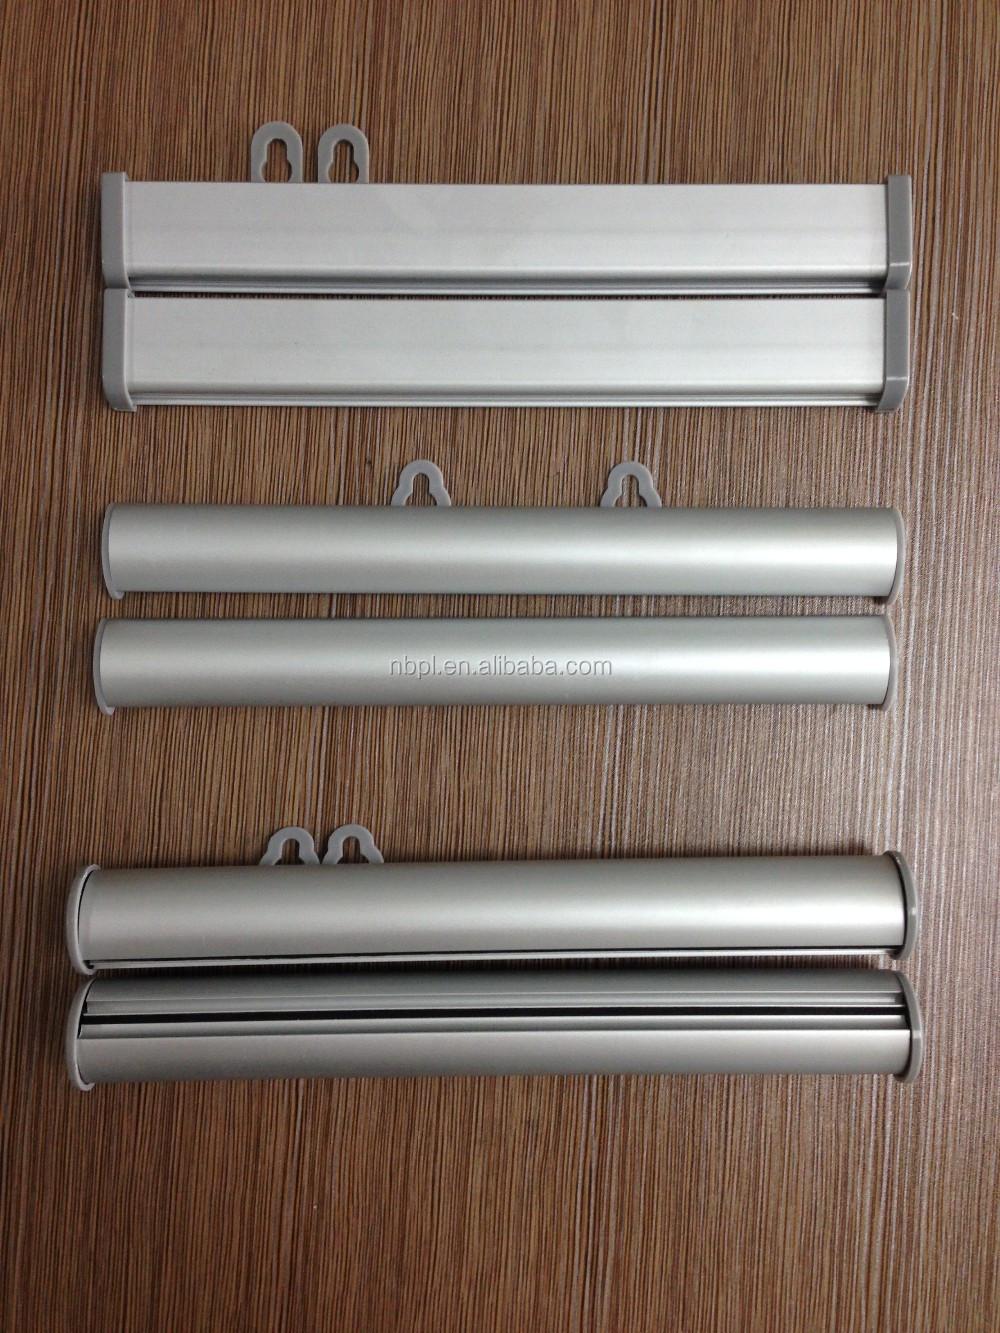 Aluminum Hanging Poster Clip Rail Buy Poster Clip Rail